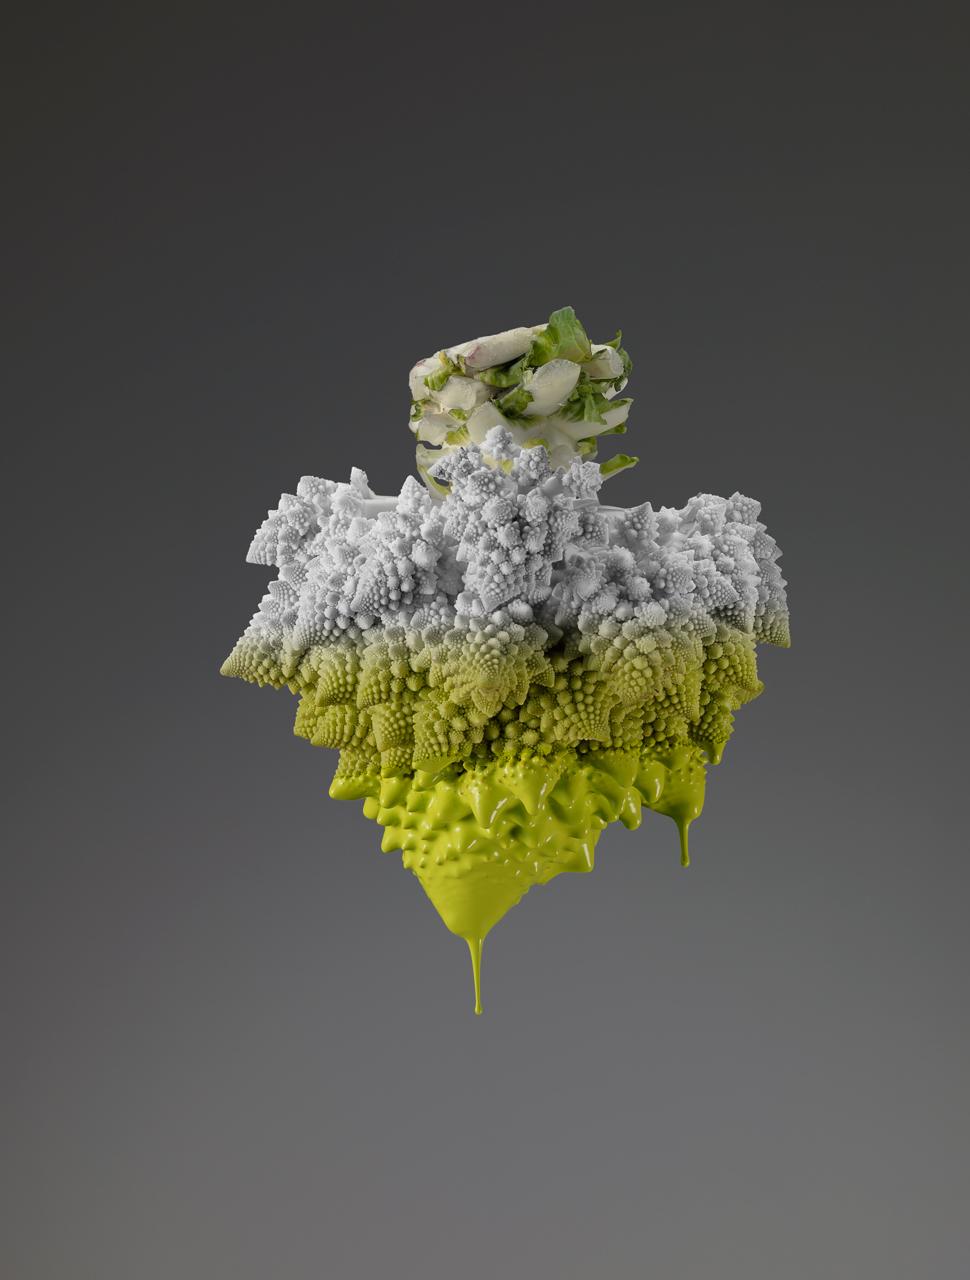 giorgio-cravero-colors-series-4.jpg